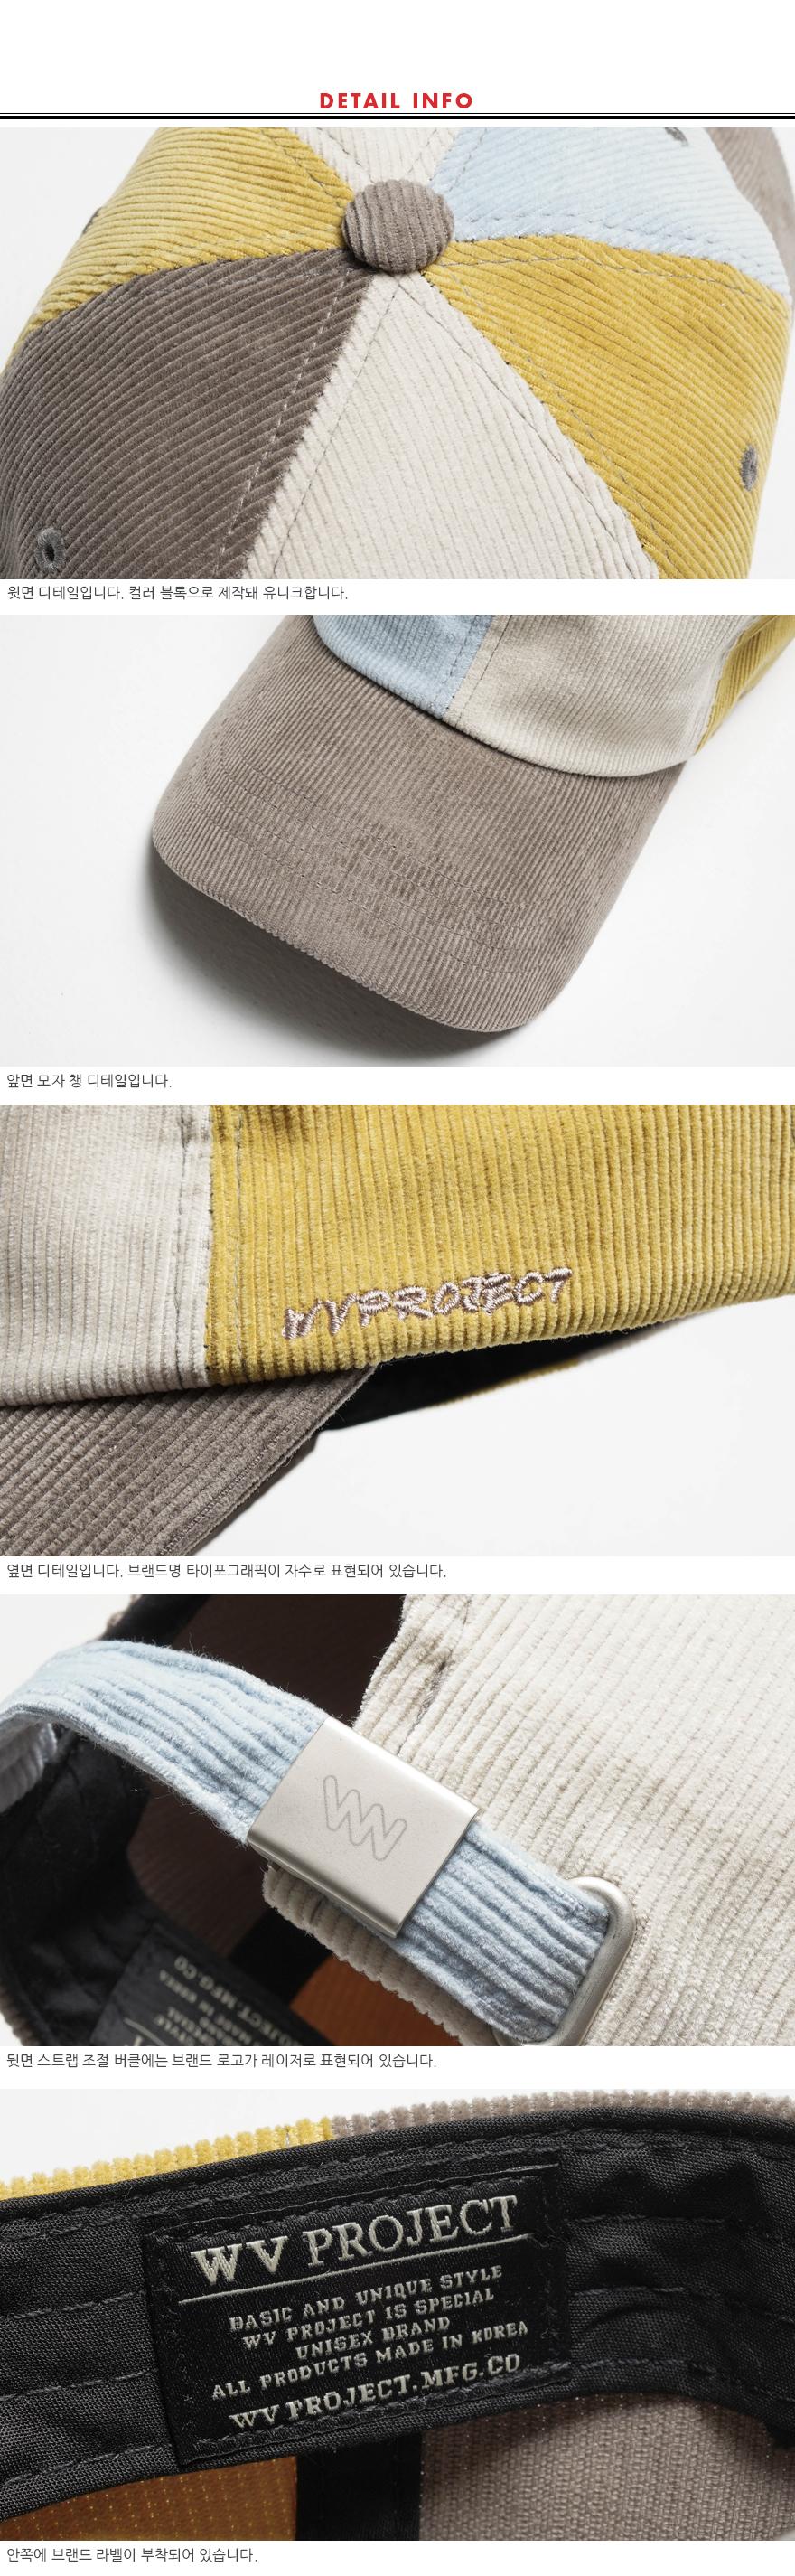 MJAC7411_detail_cocoa_cj.jpg